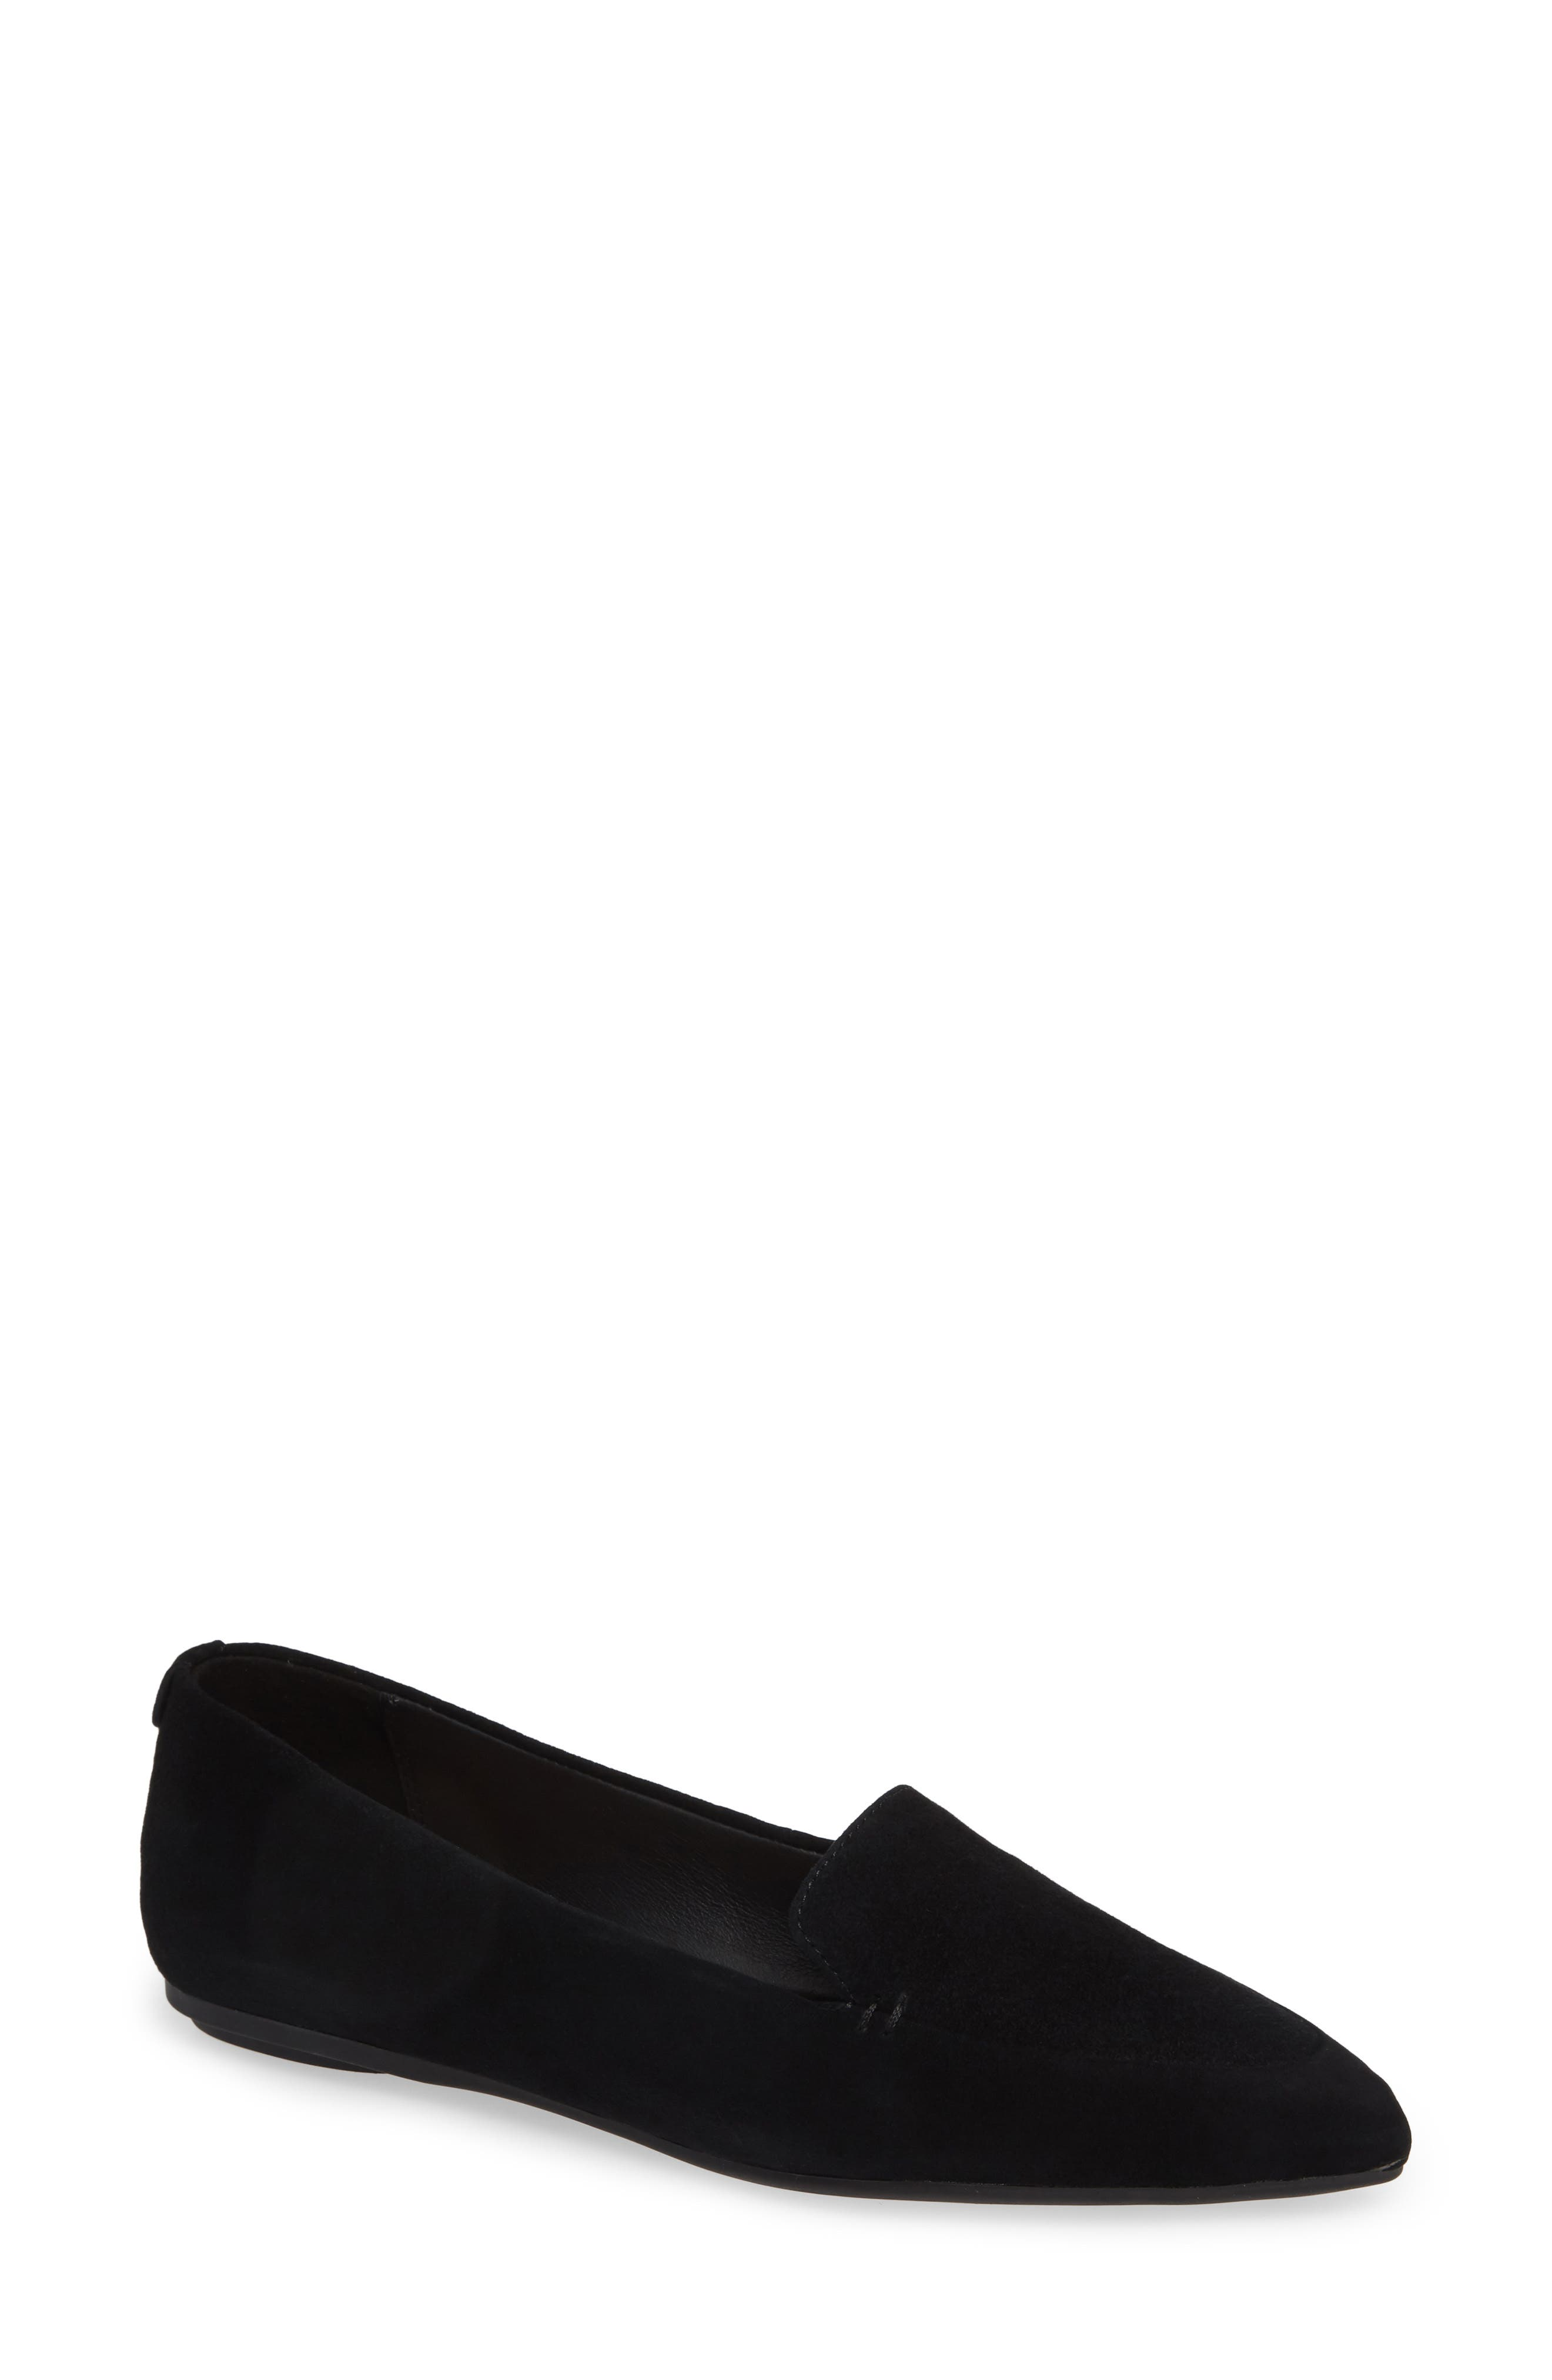 TARYN ROSE Faye Pointy Toe Loafer, Main, color, BLACK/ BLACK SUEDE